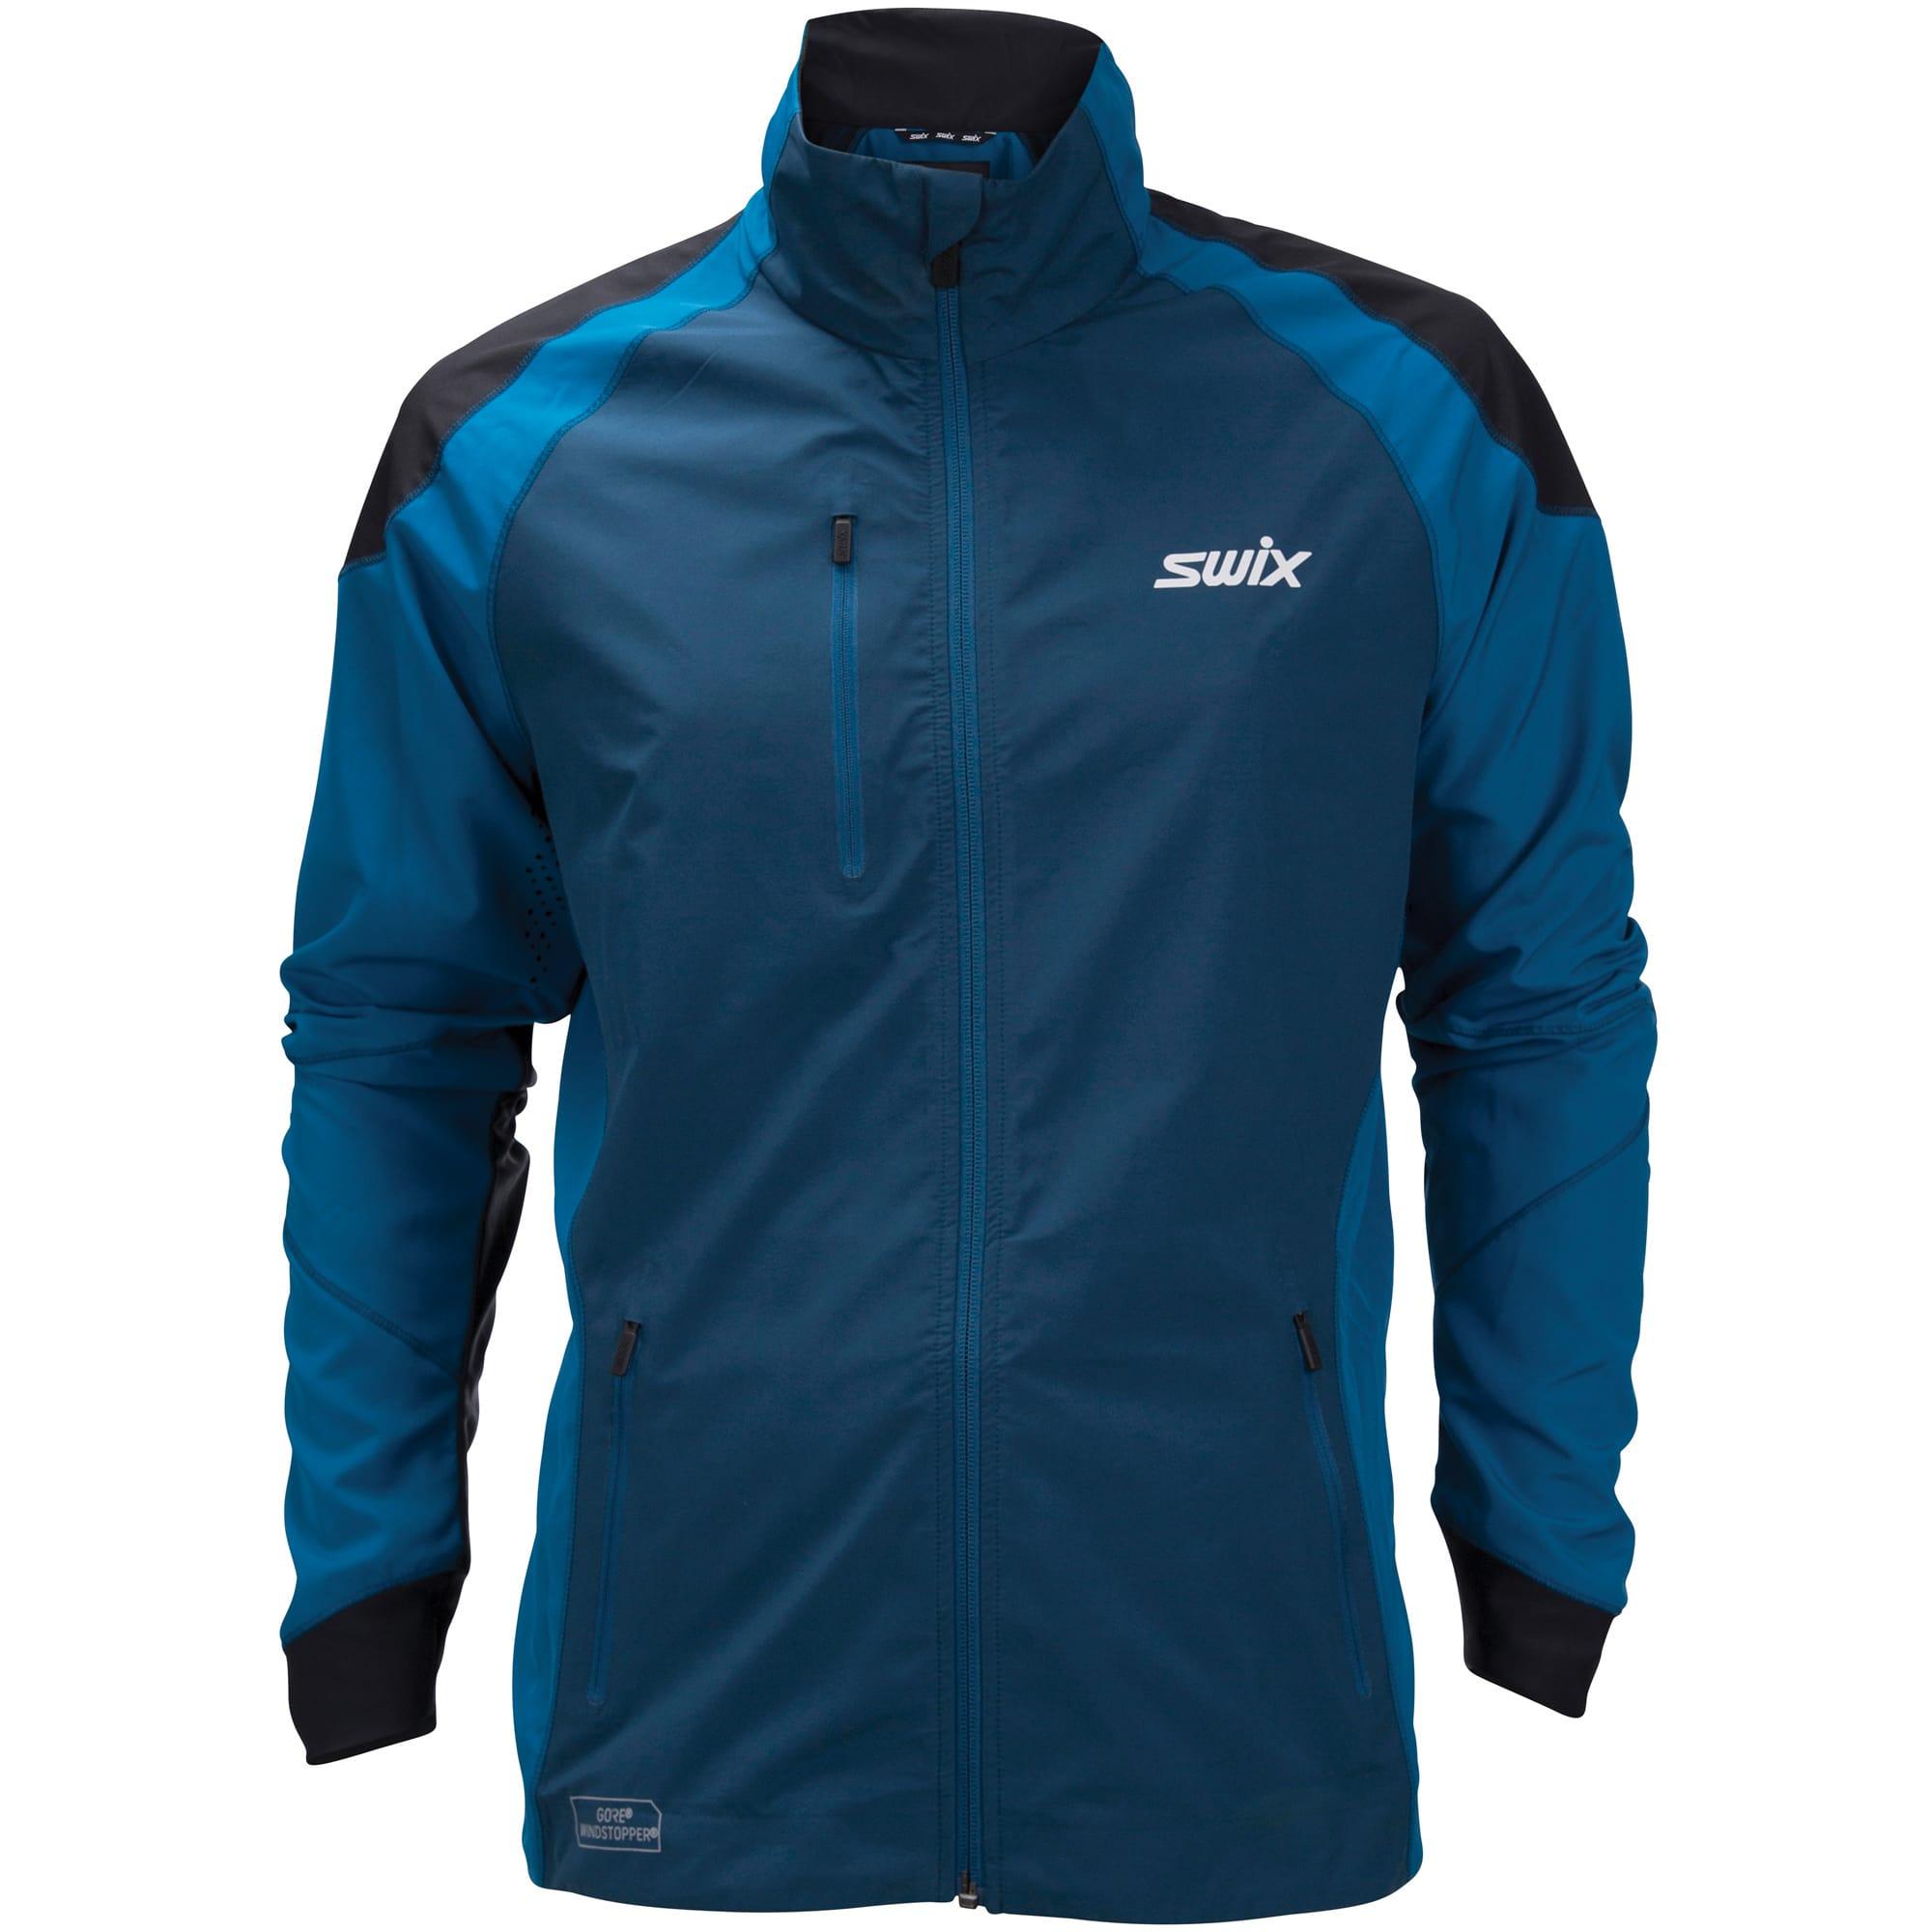 Men's ProFit Revolution Jacket